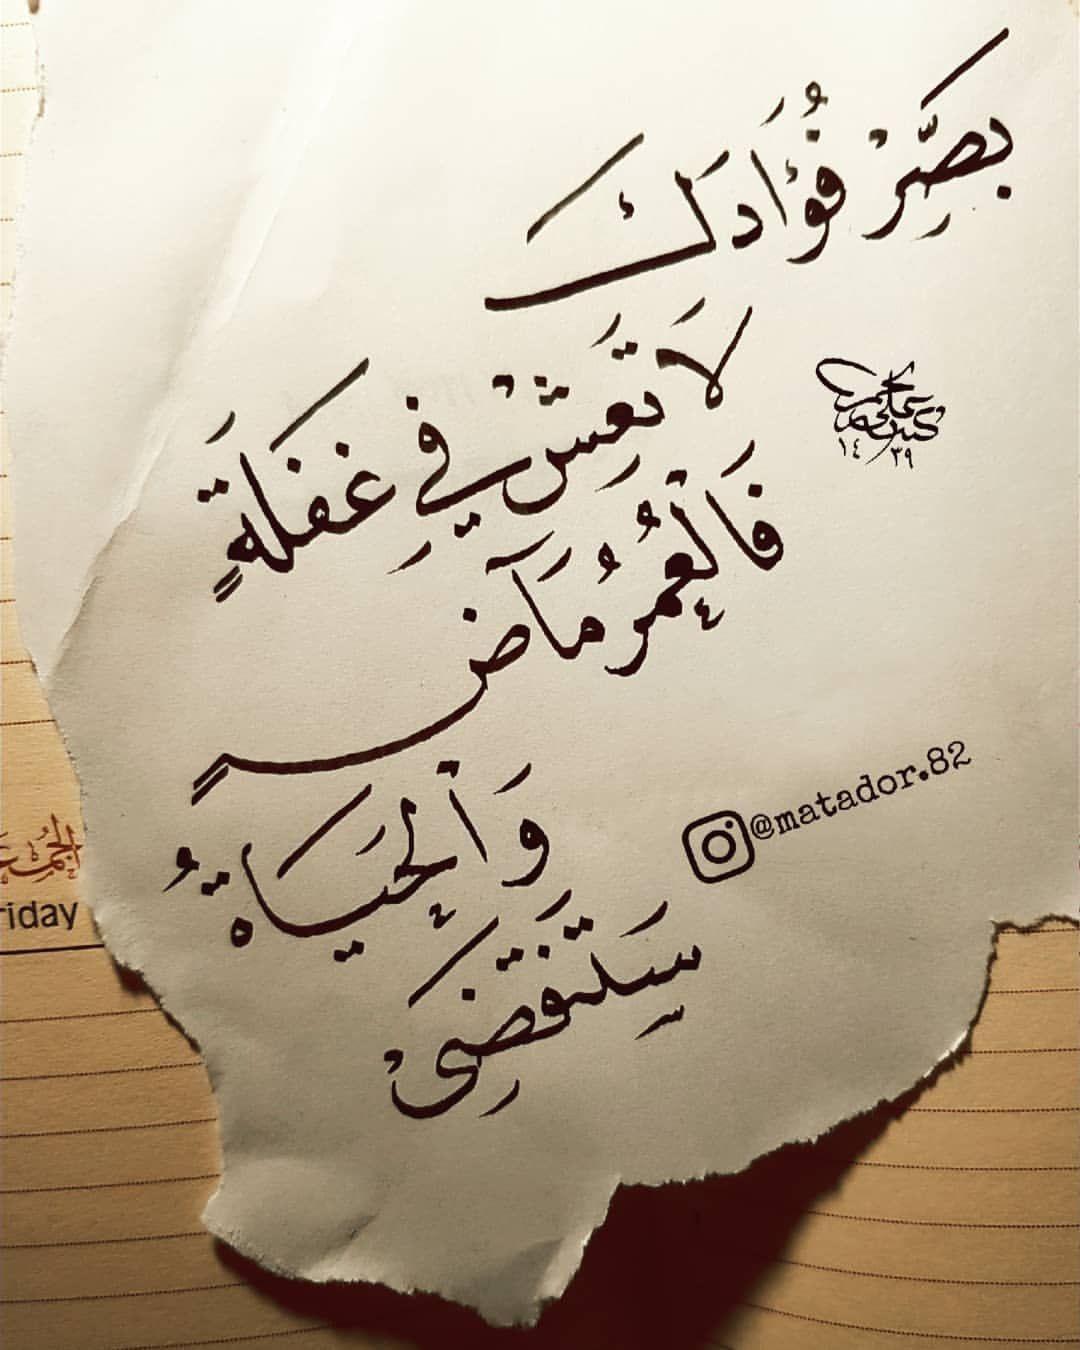 589 Likes 20 Comments Ali Najm Matador 82 On Instagram و الحياة ستنقضي مساكم خير م Islamic Love Quotes Arabic Quotes Beautiful Arabic Words